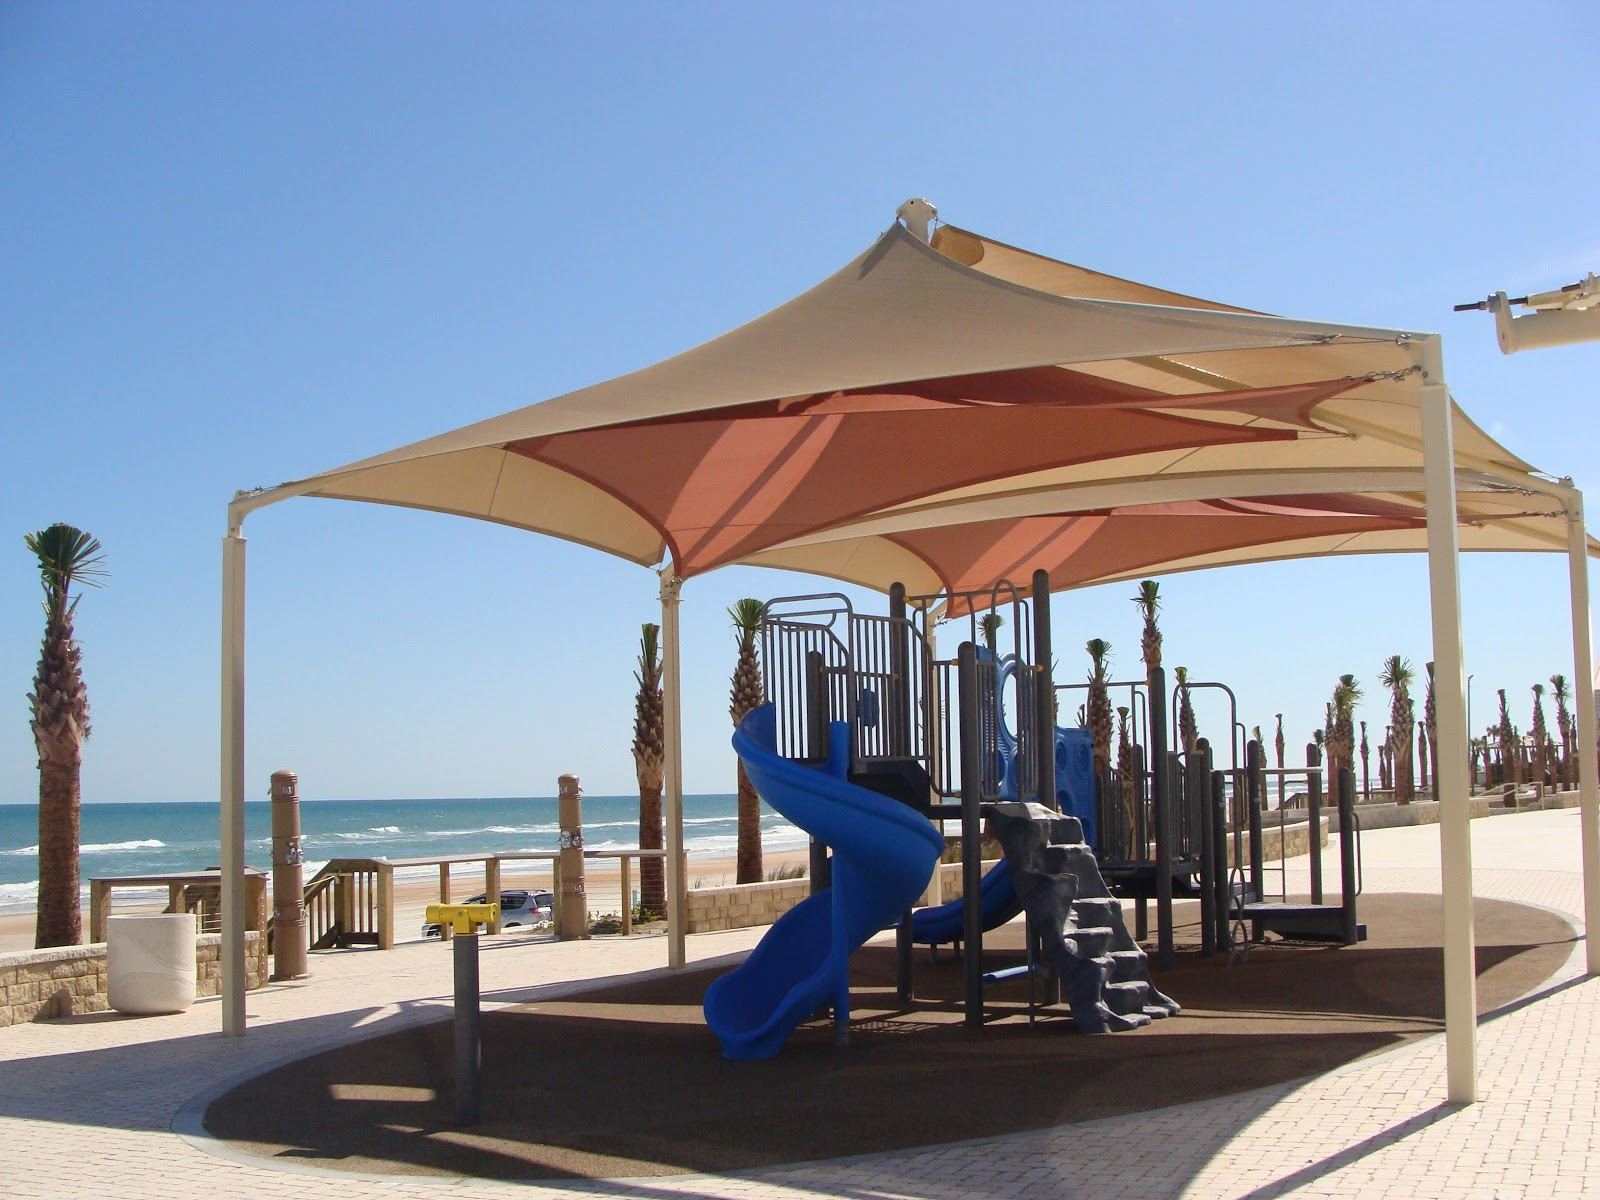 Ormond Beach S Andy Romano Beachfront Park